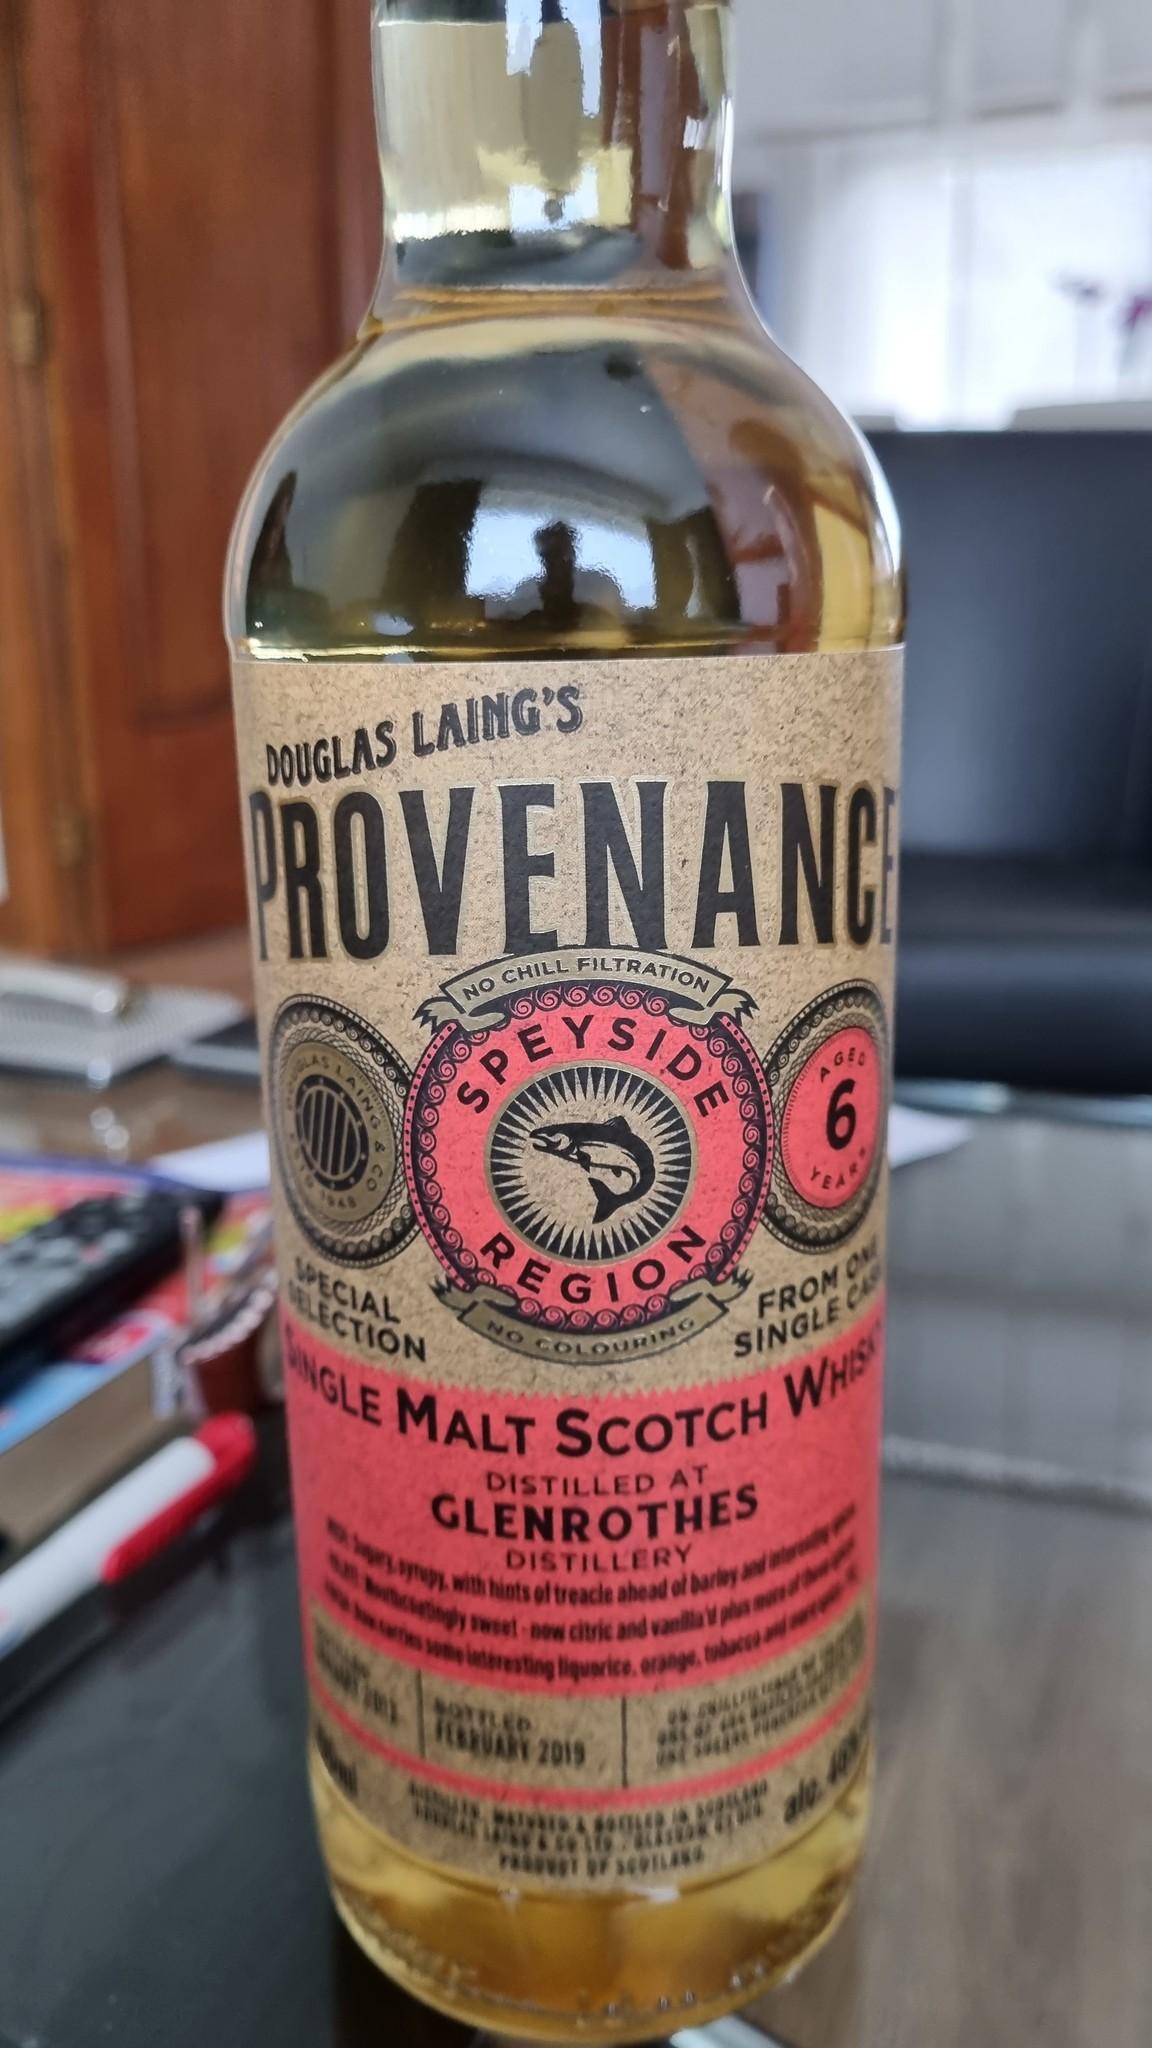 Douglas Laing Glenrothes  6Y 2013-2019  46% Provenance Douglas Laing